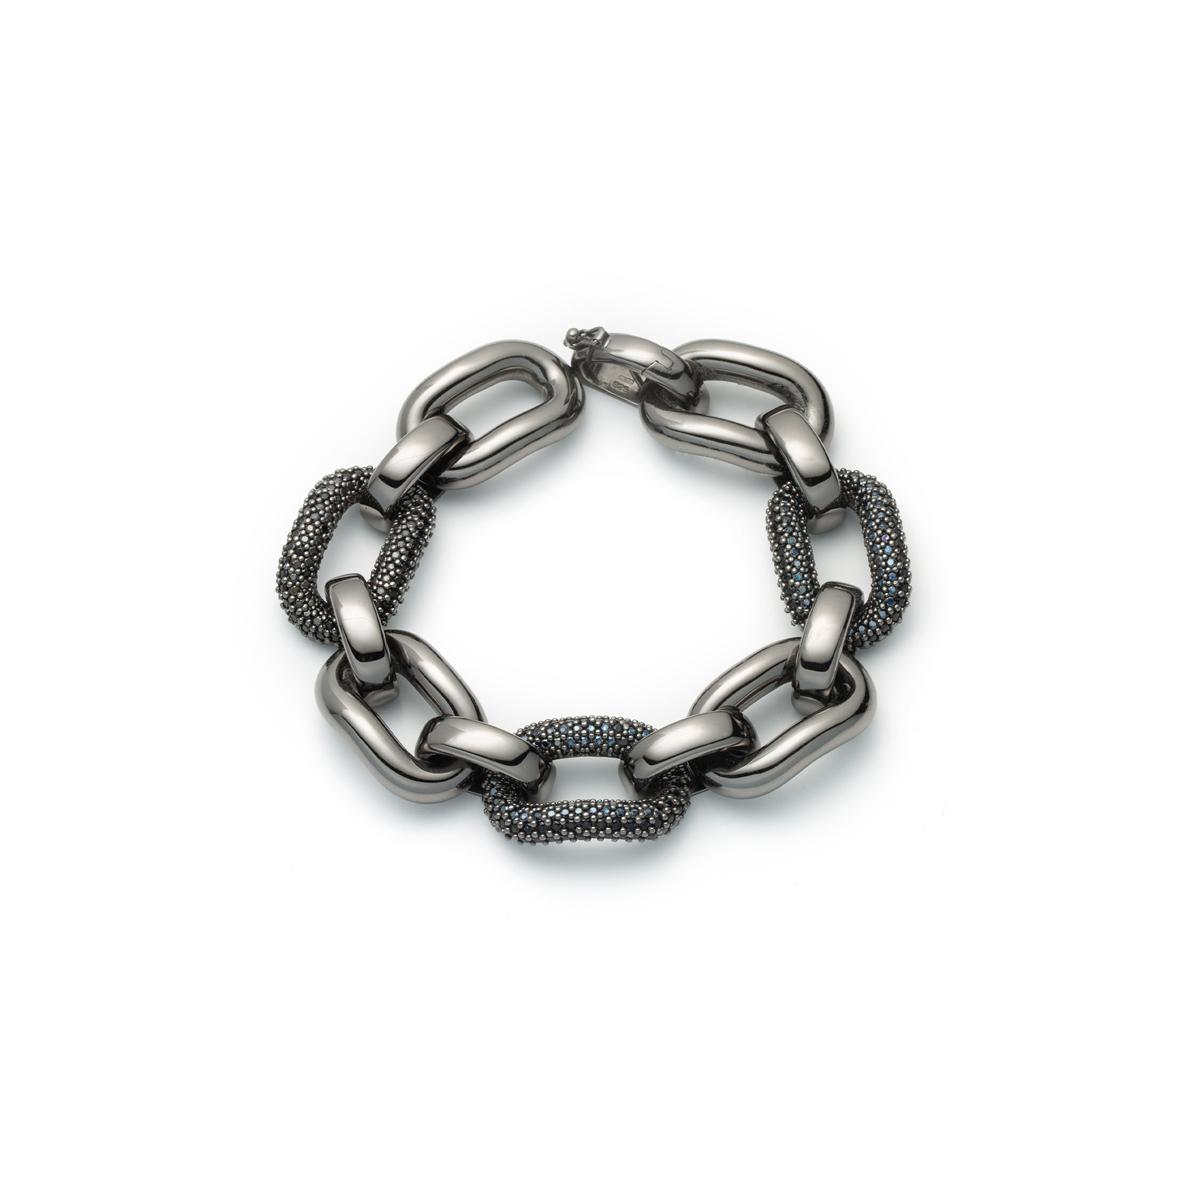 Black Silver and Spinel Stone Link Bracelet